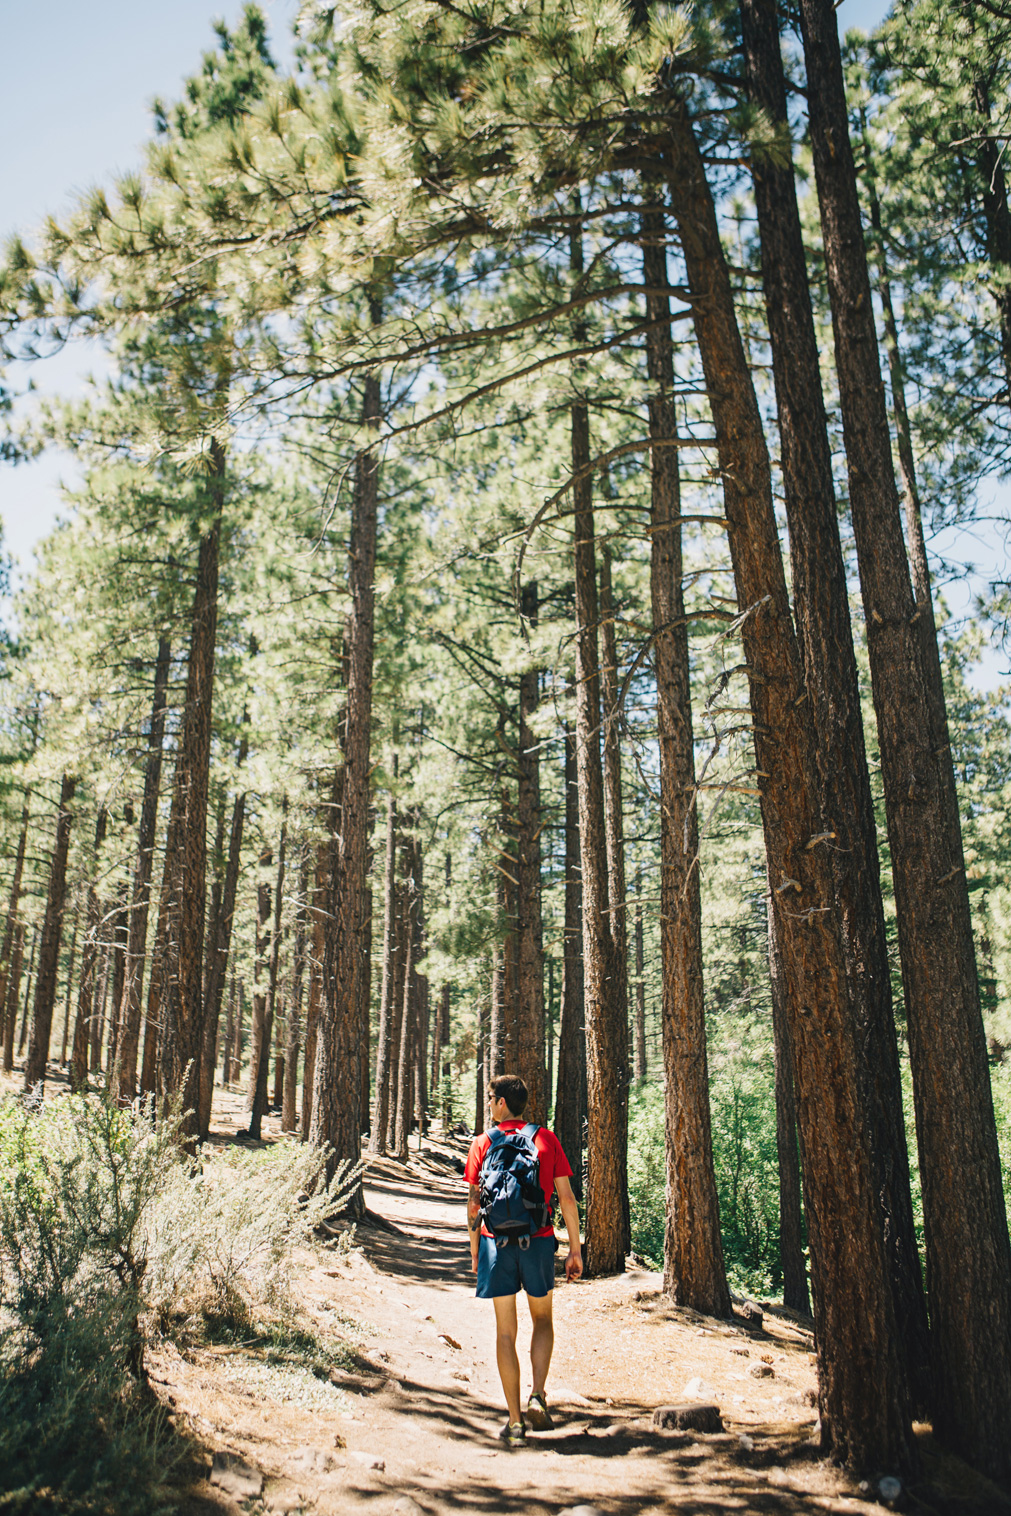 CindyGiovagnoli_Galena_Creek_Visitors_Center_hike_Reno_Tahoe_Nevada_outdoor_activities-003.jpg